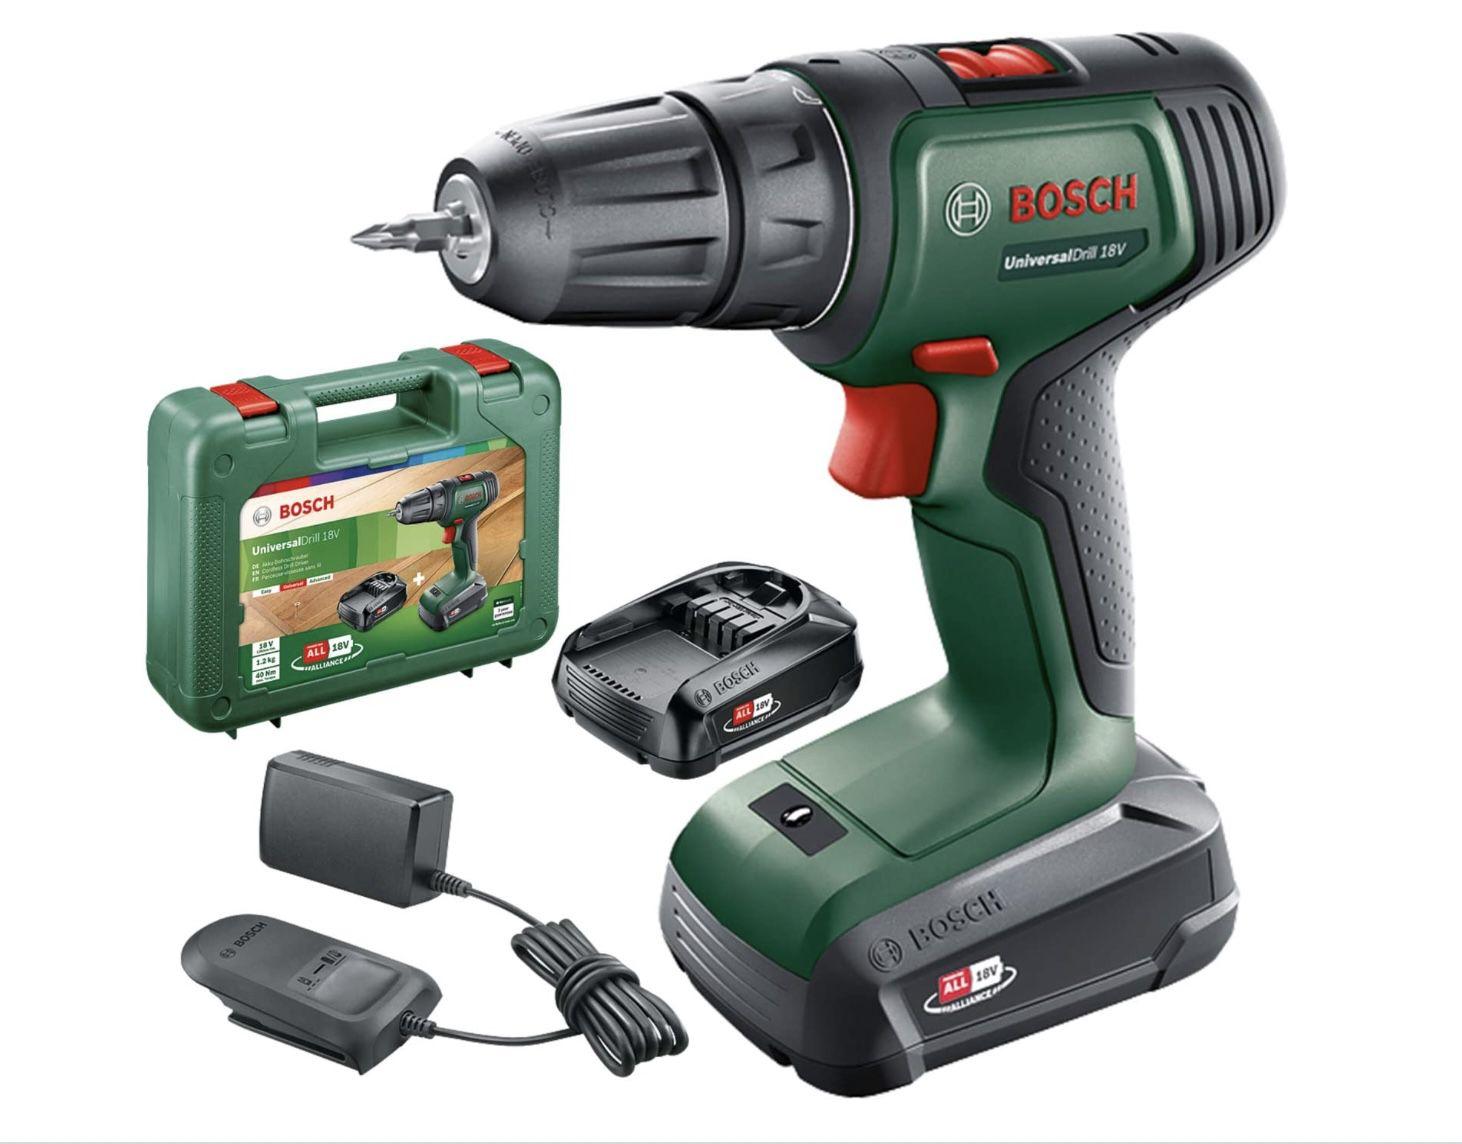 Bosch 06039D4002 Akkuschrauber UniversalDrill 18V inkl. 2 Akkus & Koffer für 94,19€ (statt 107€)